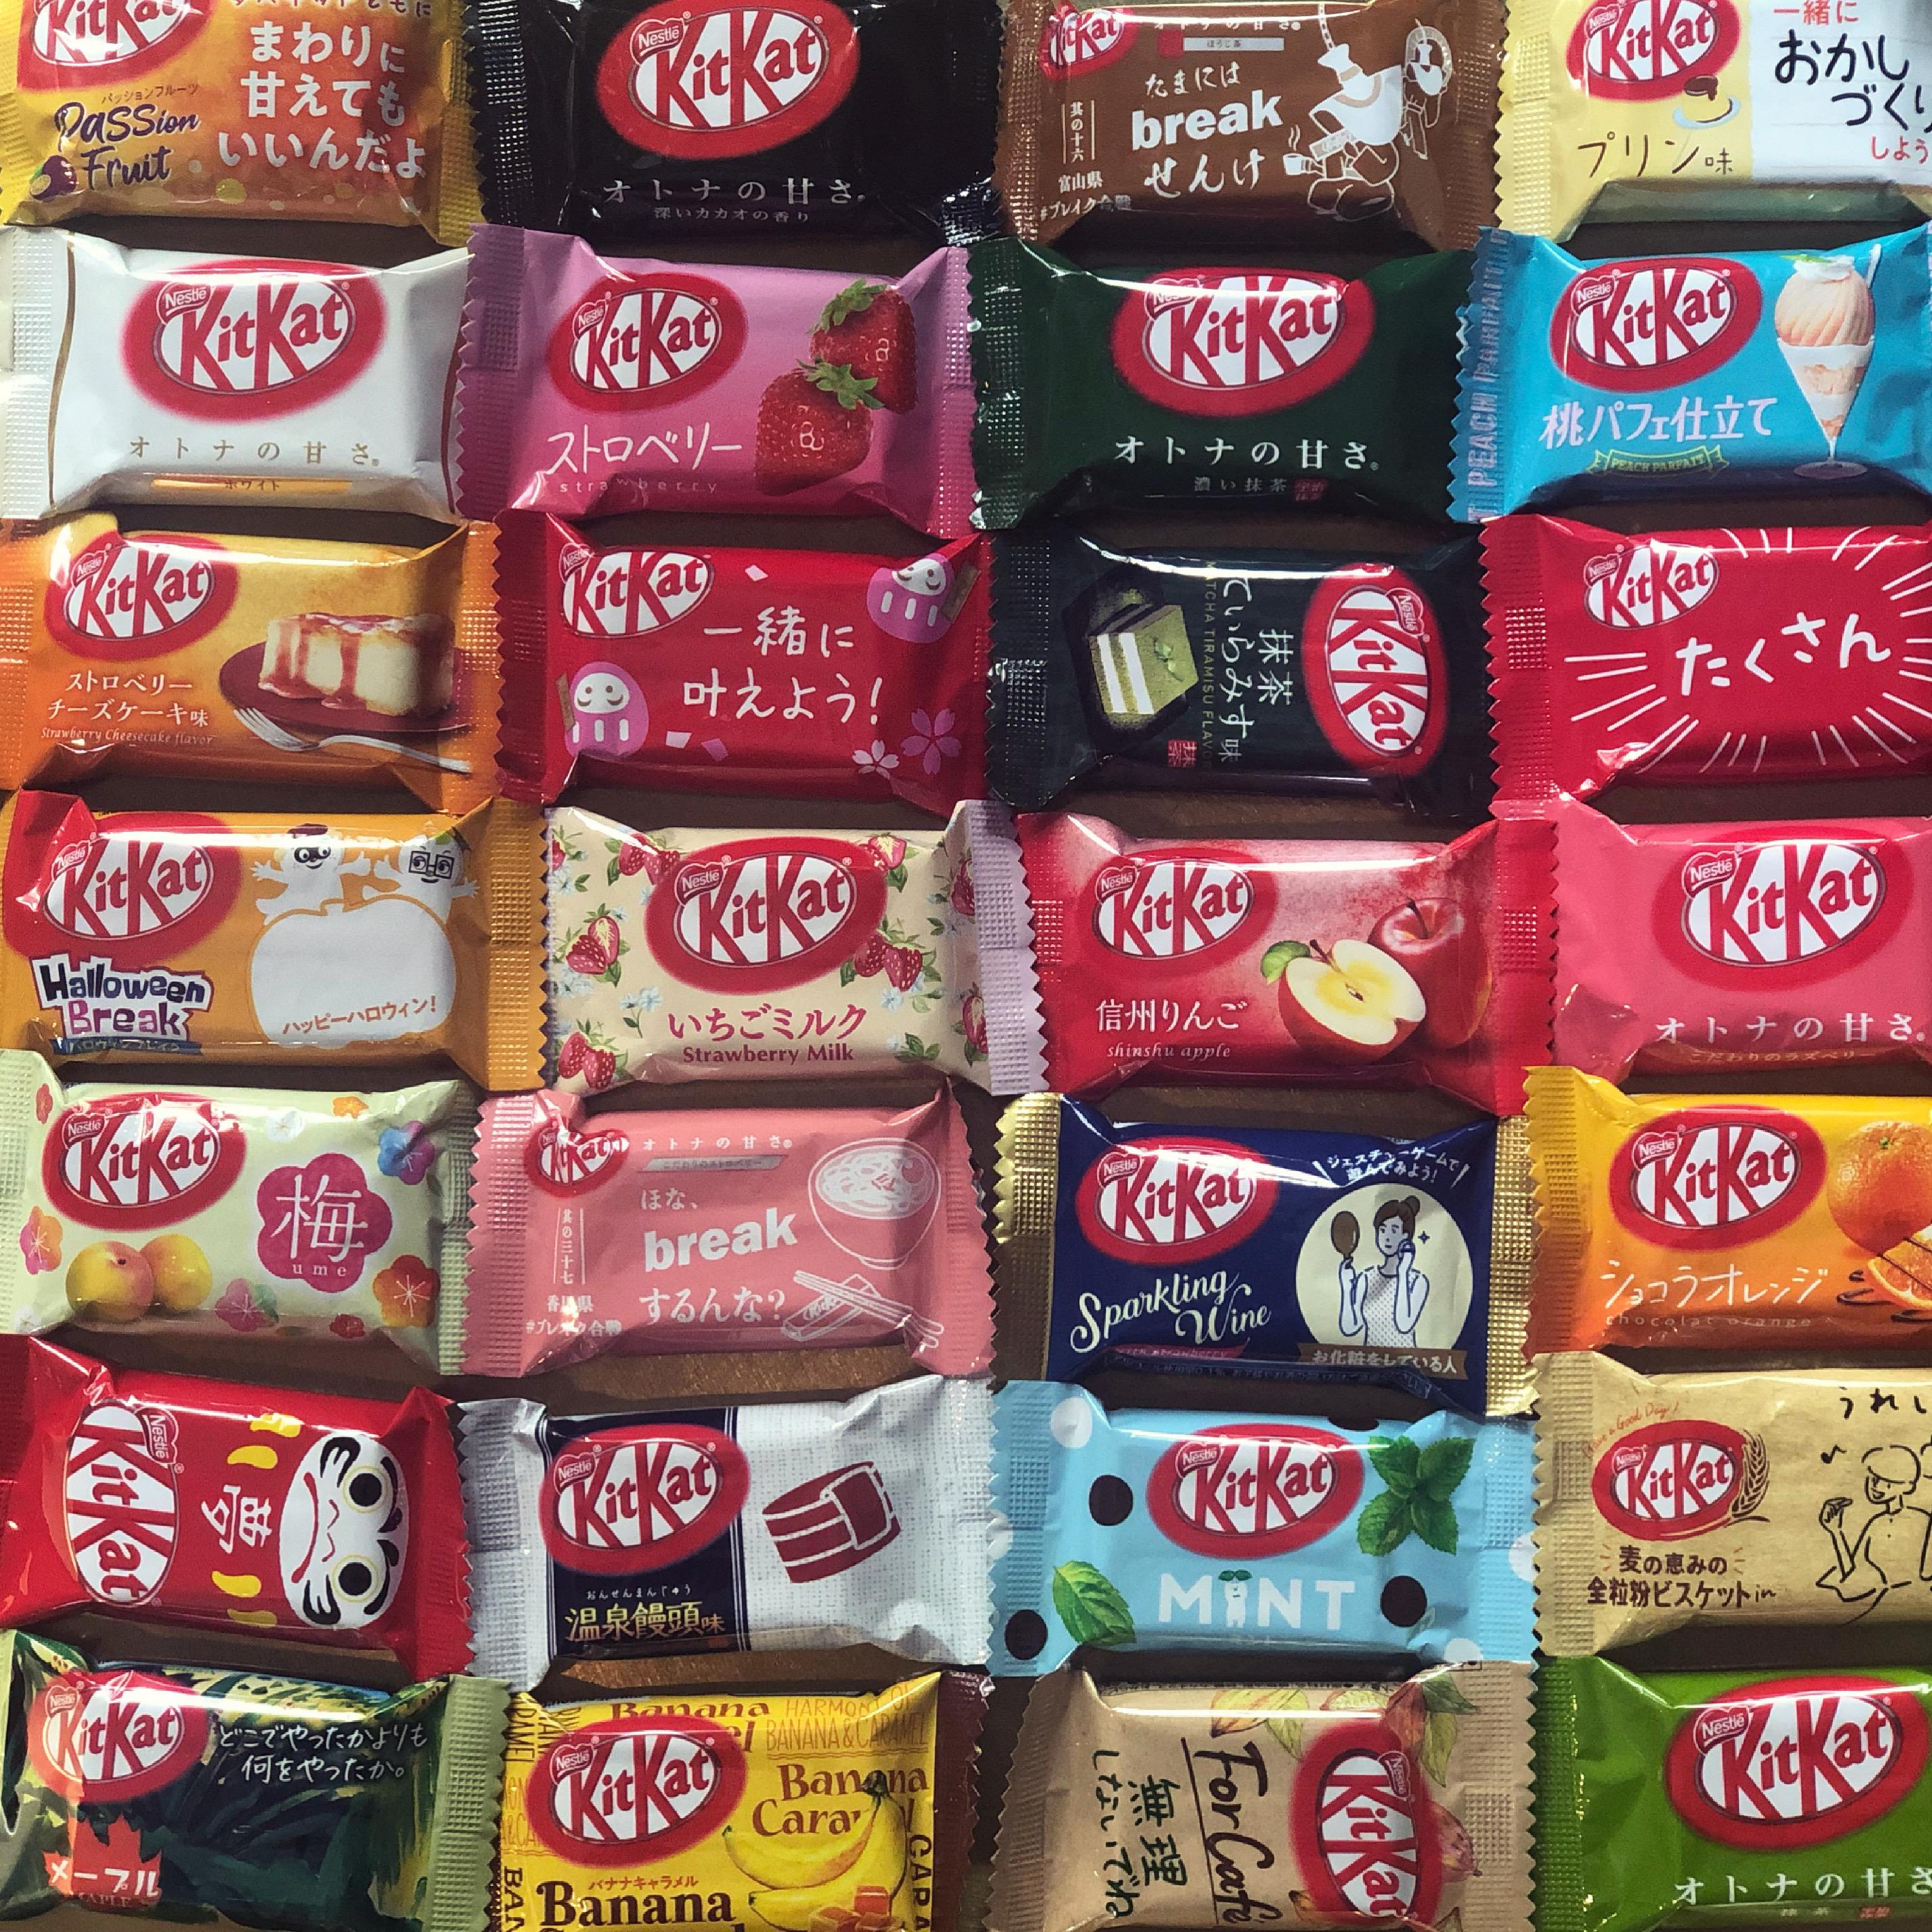 KitKat 28 maun pakkaus